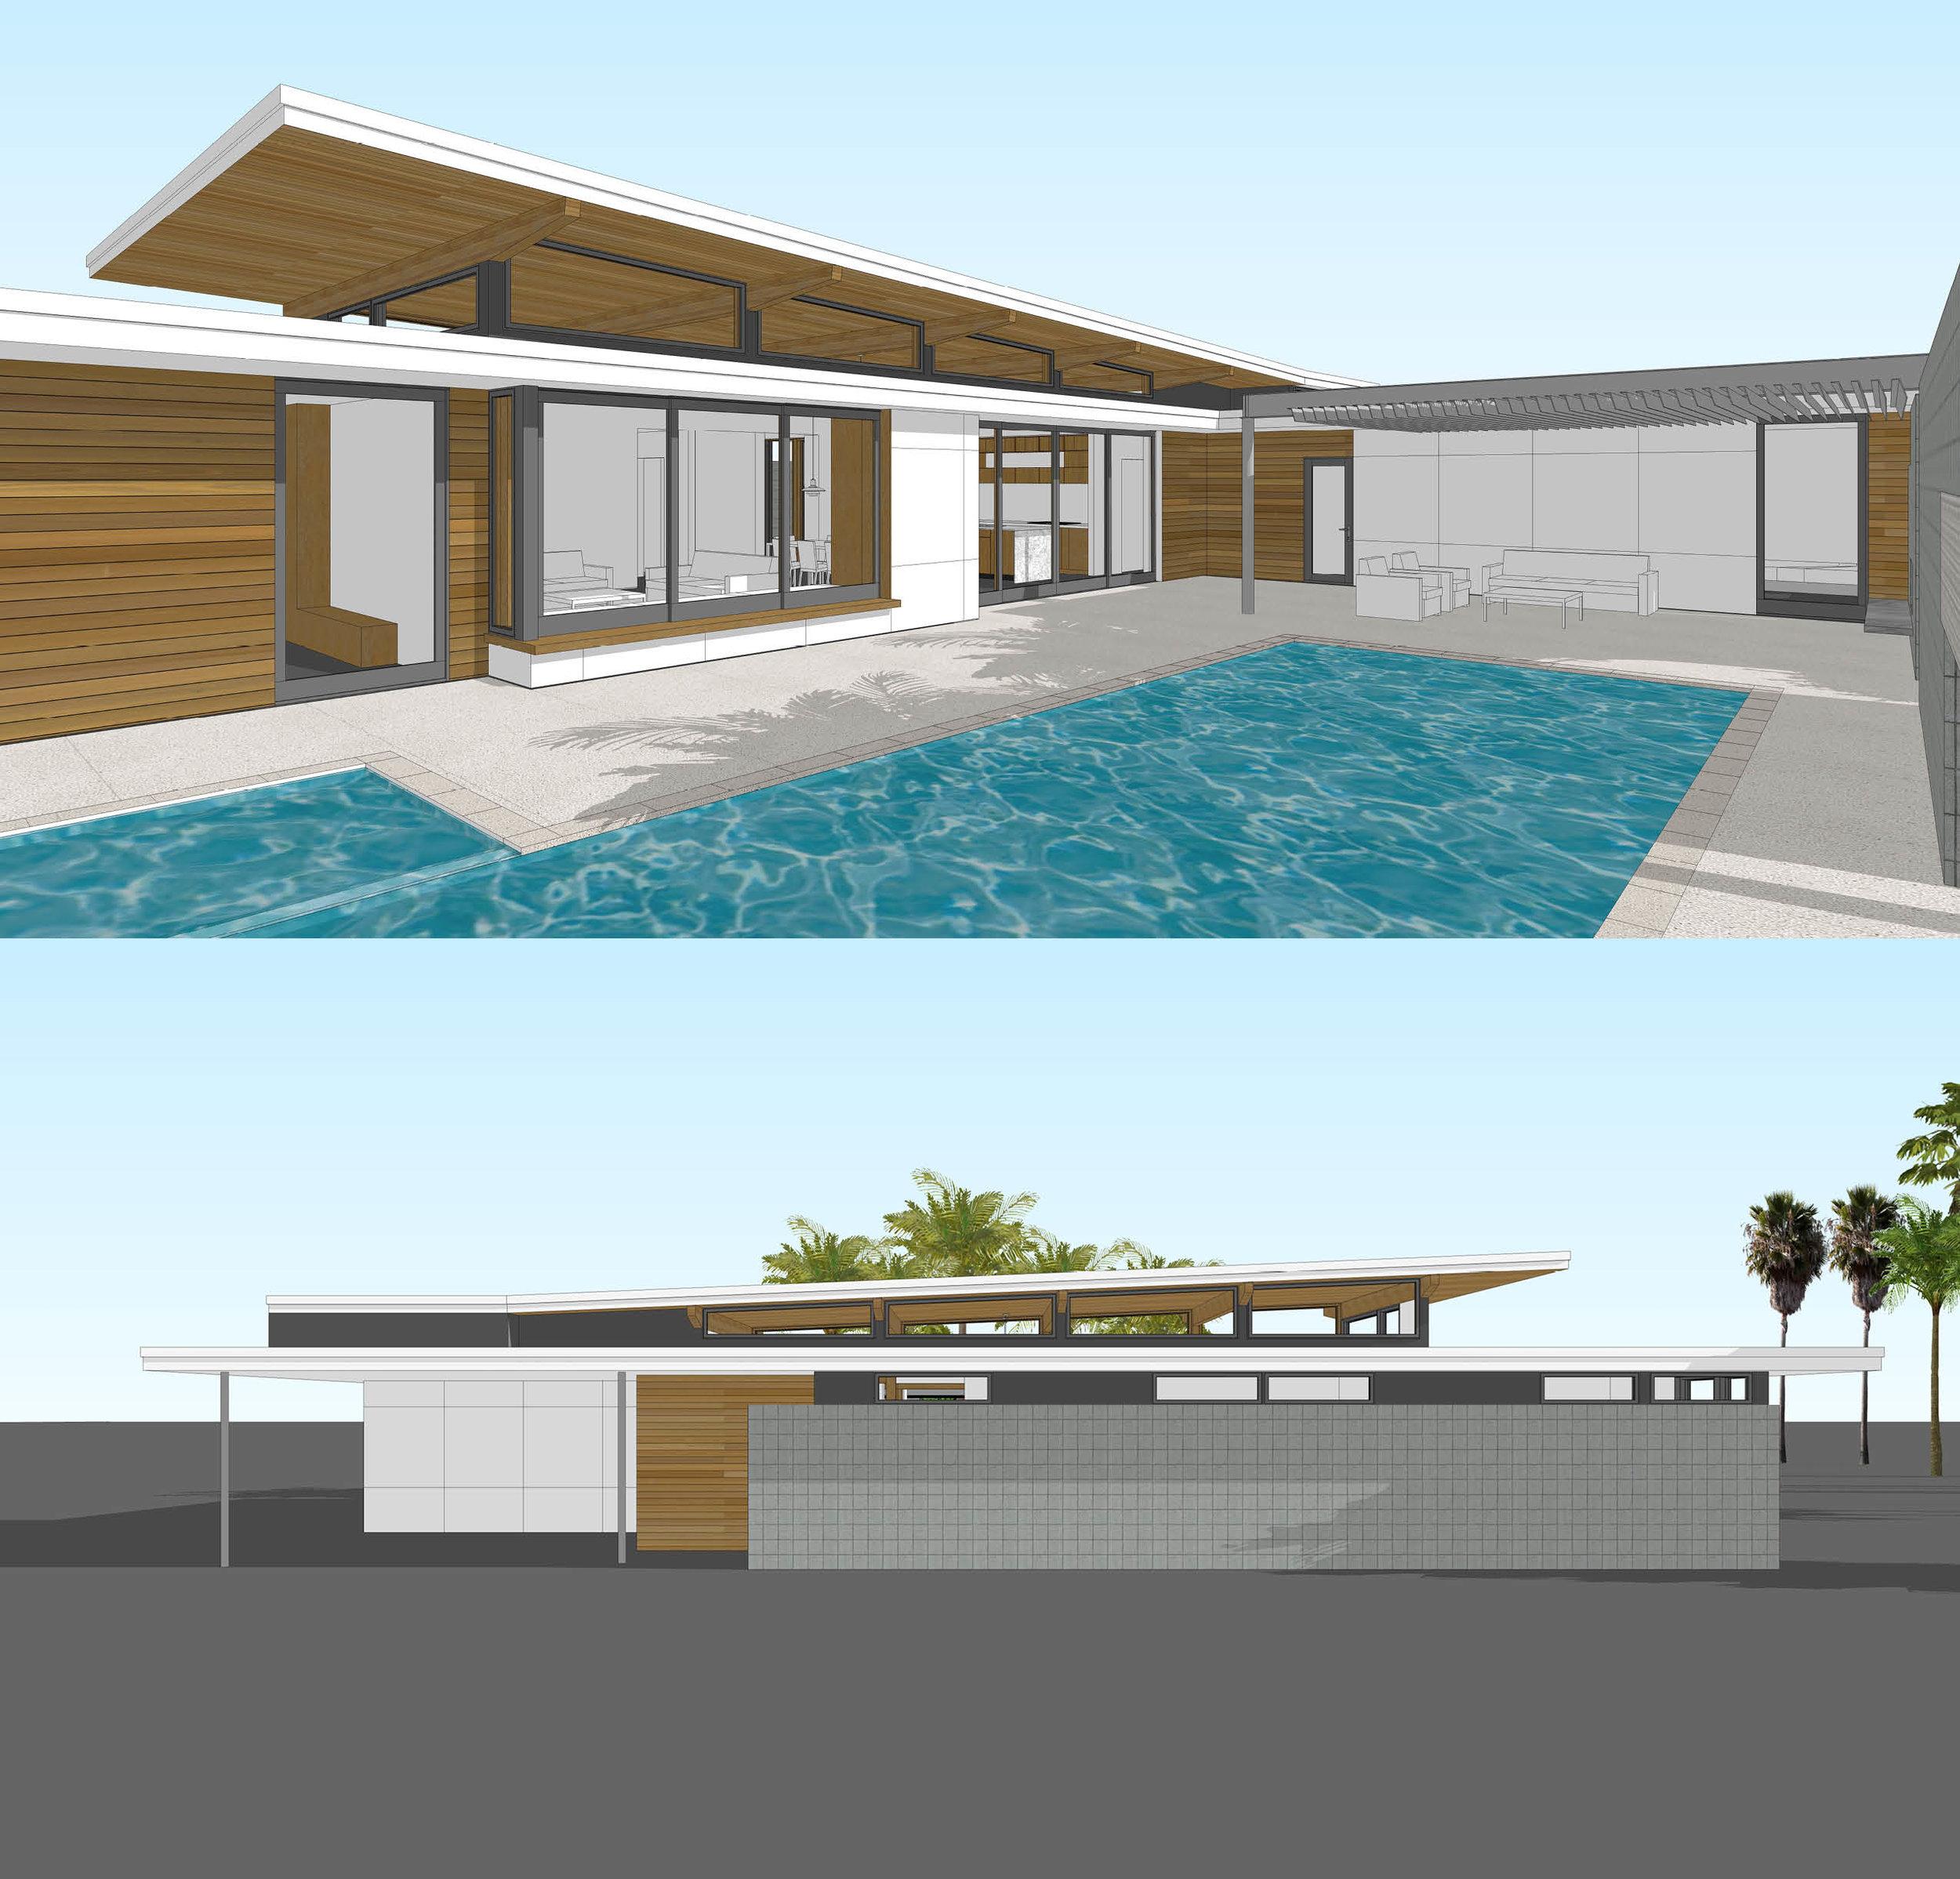 turkel_design_modern_prefab_home_axiomdeserthouse_cladding_study_optionC.JPG